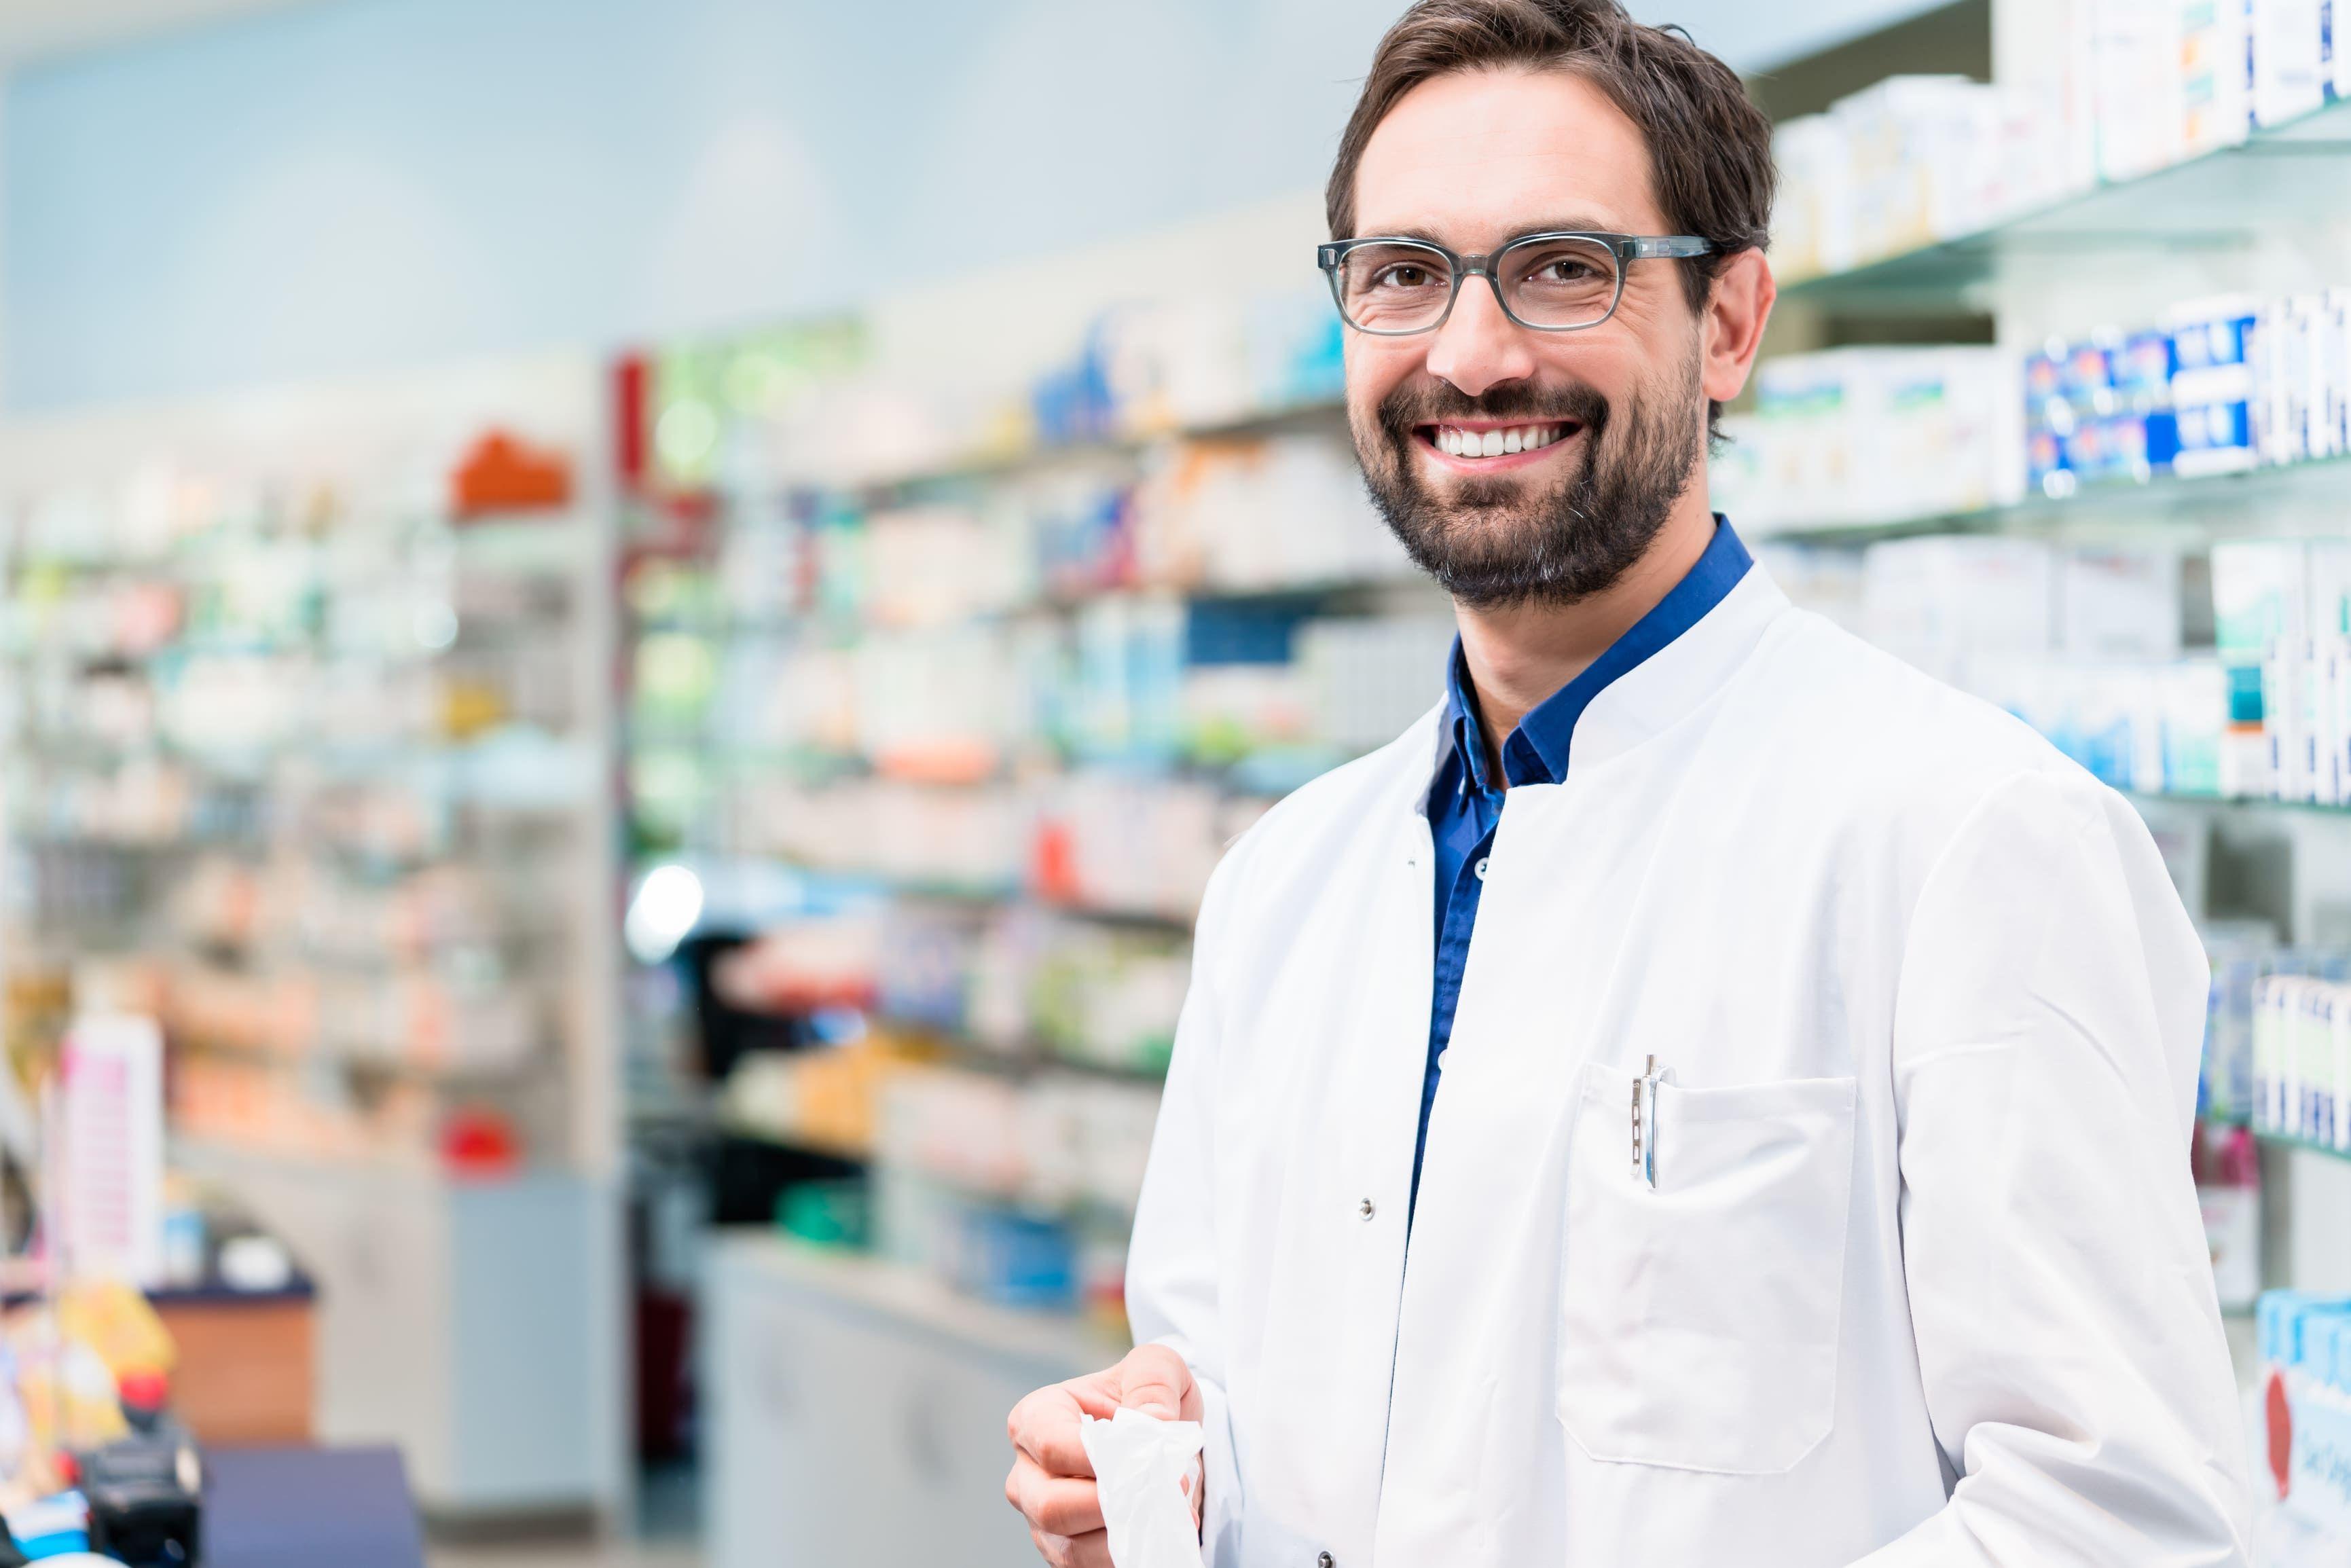 Crossroads Specialty Pharmacy